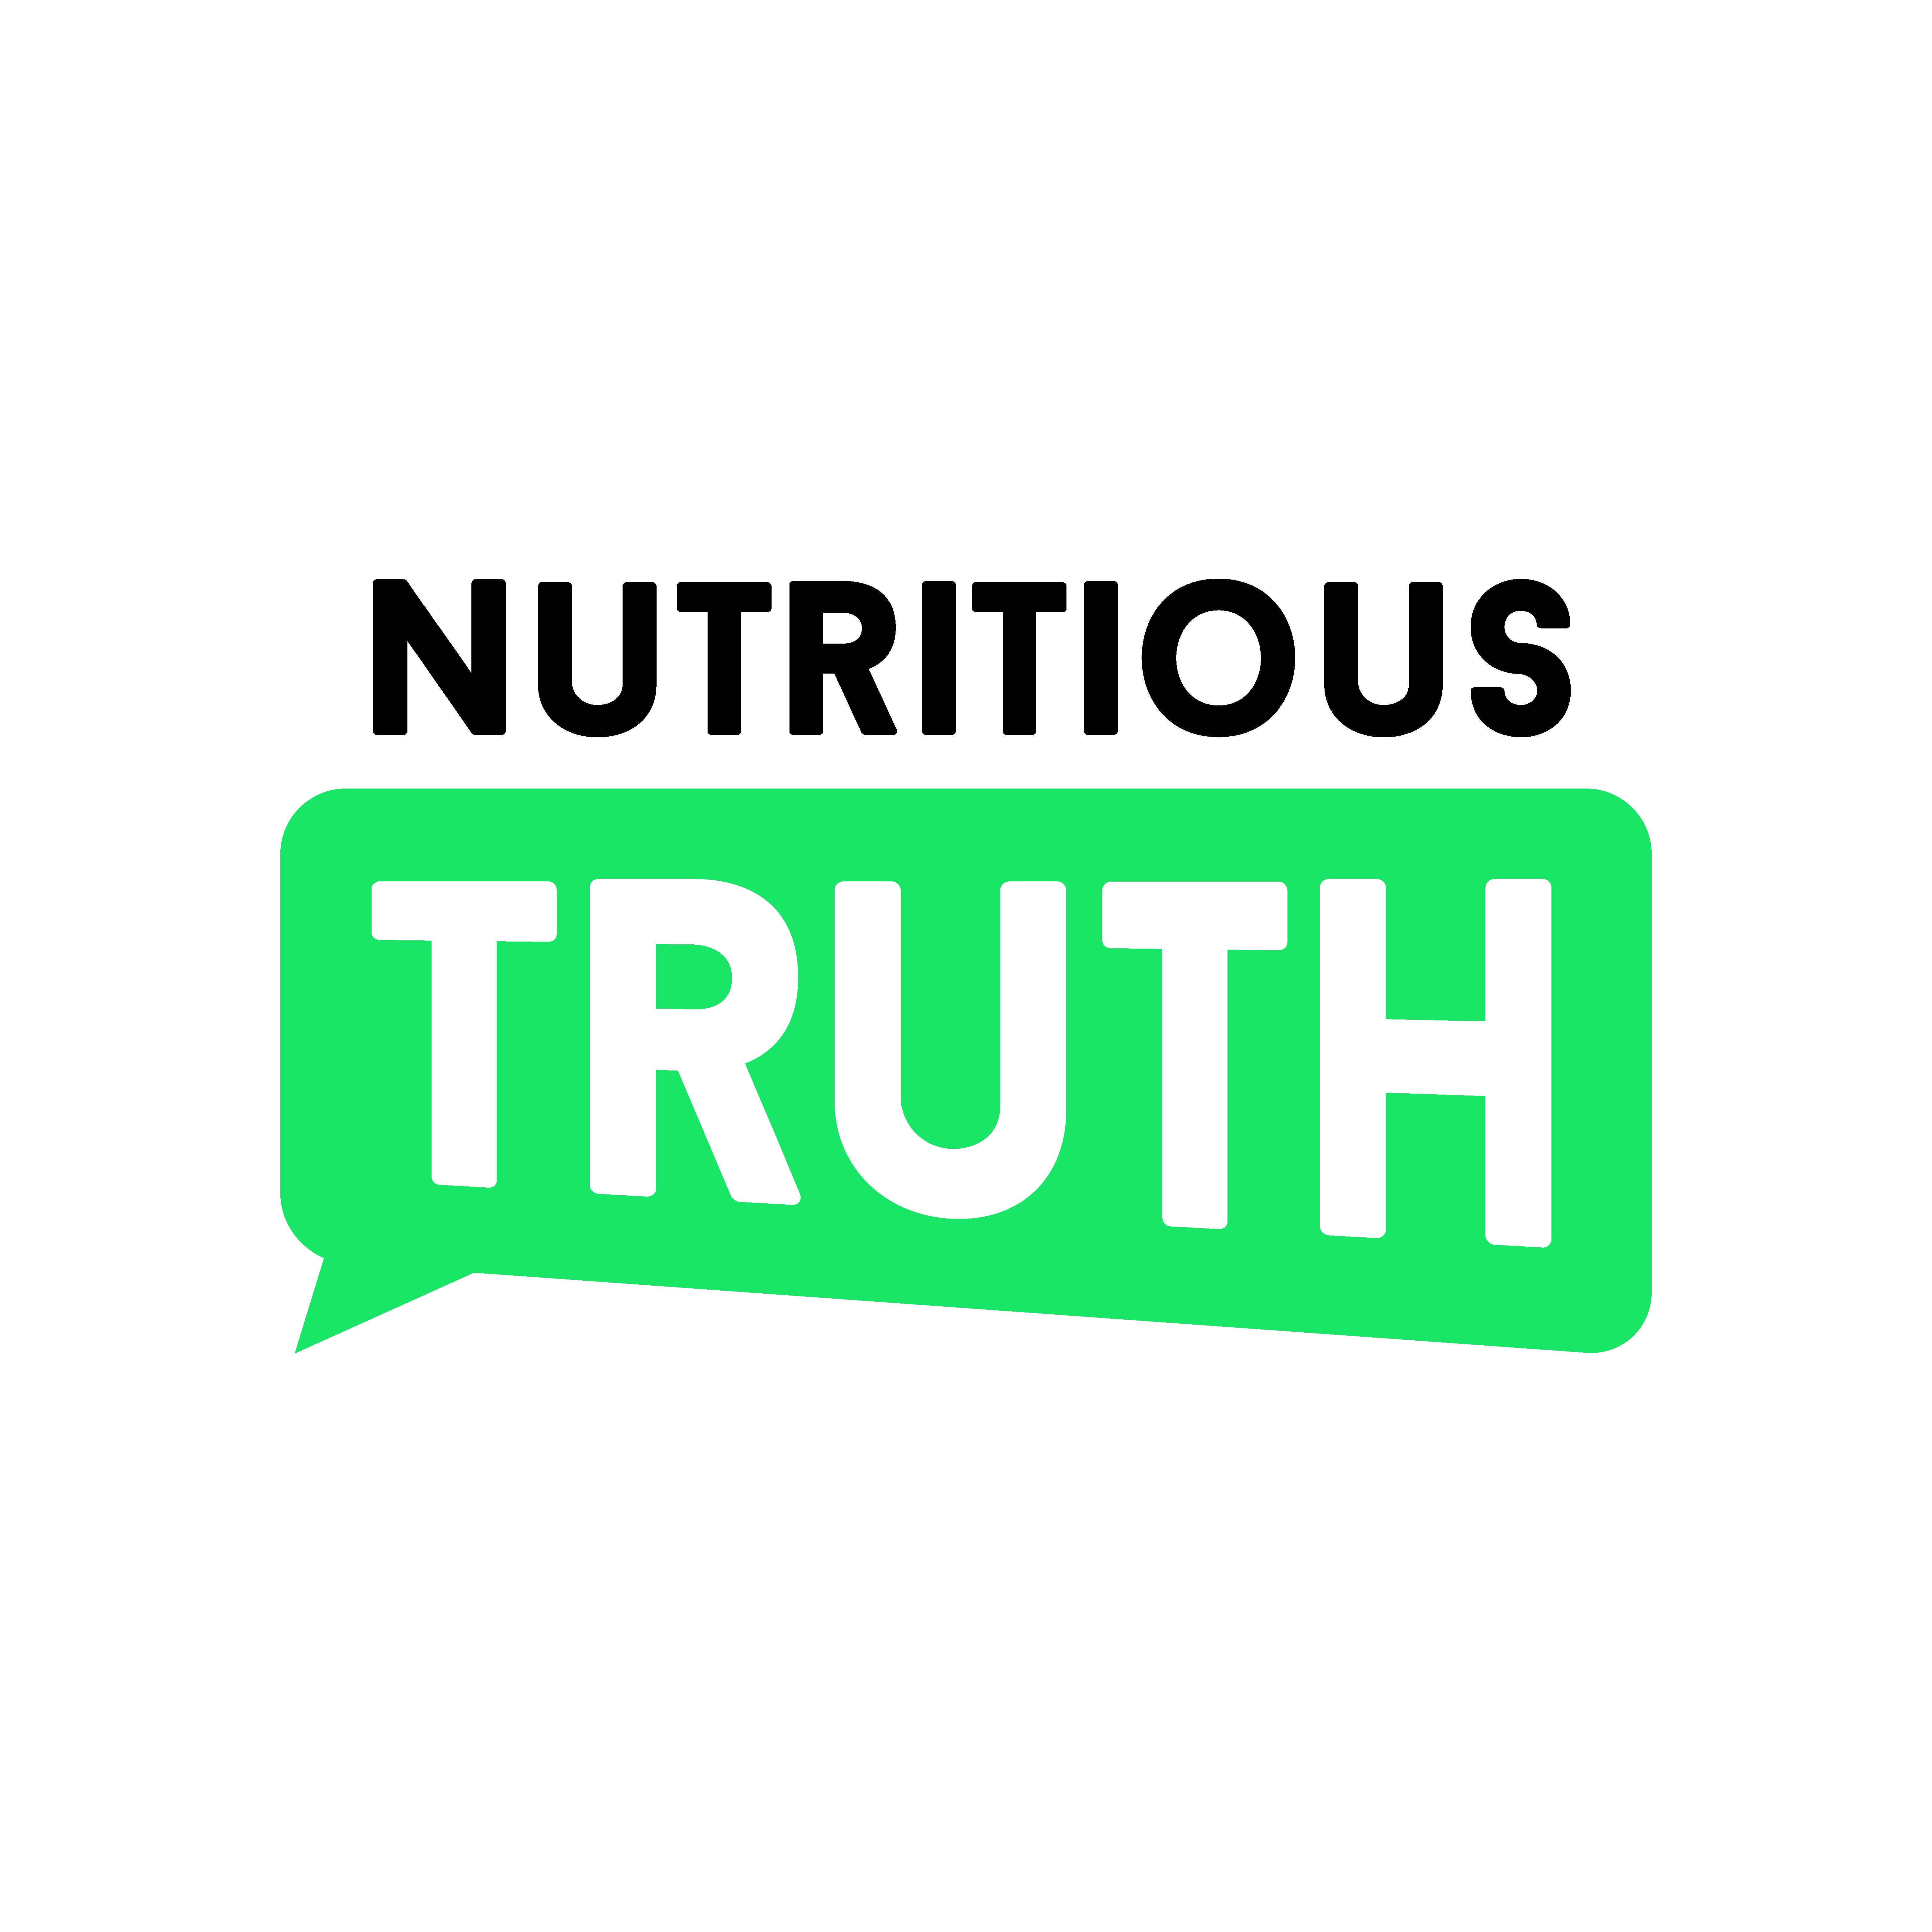 Nutritious Truth